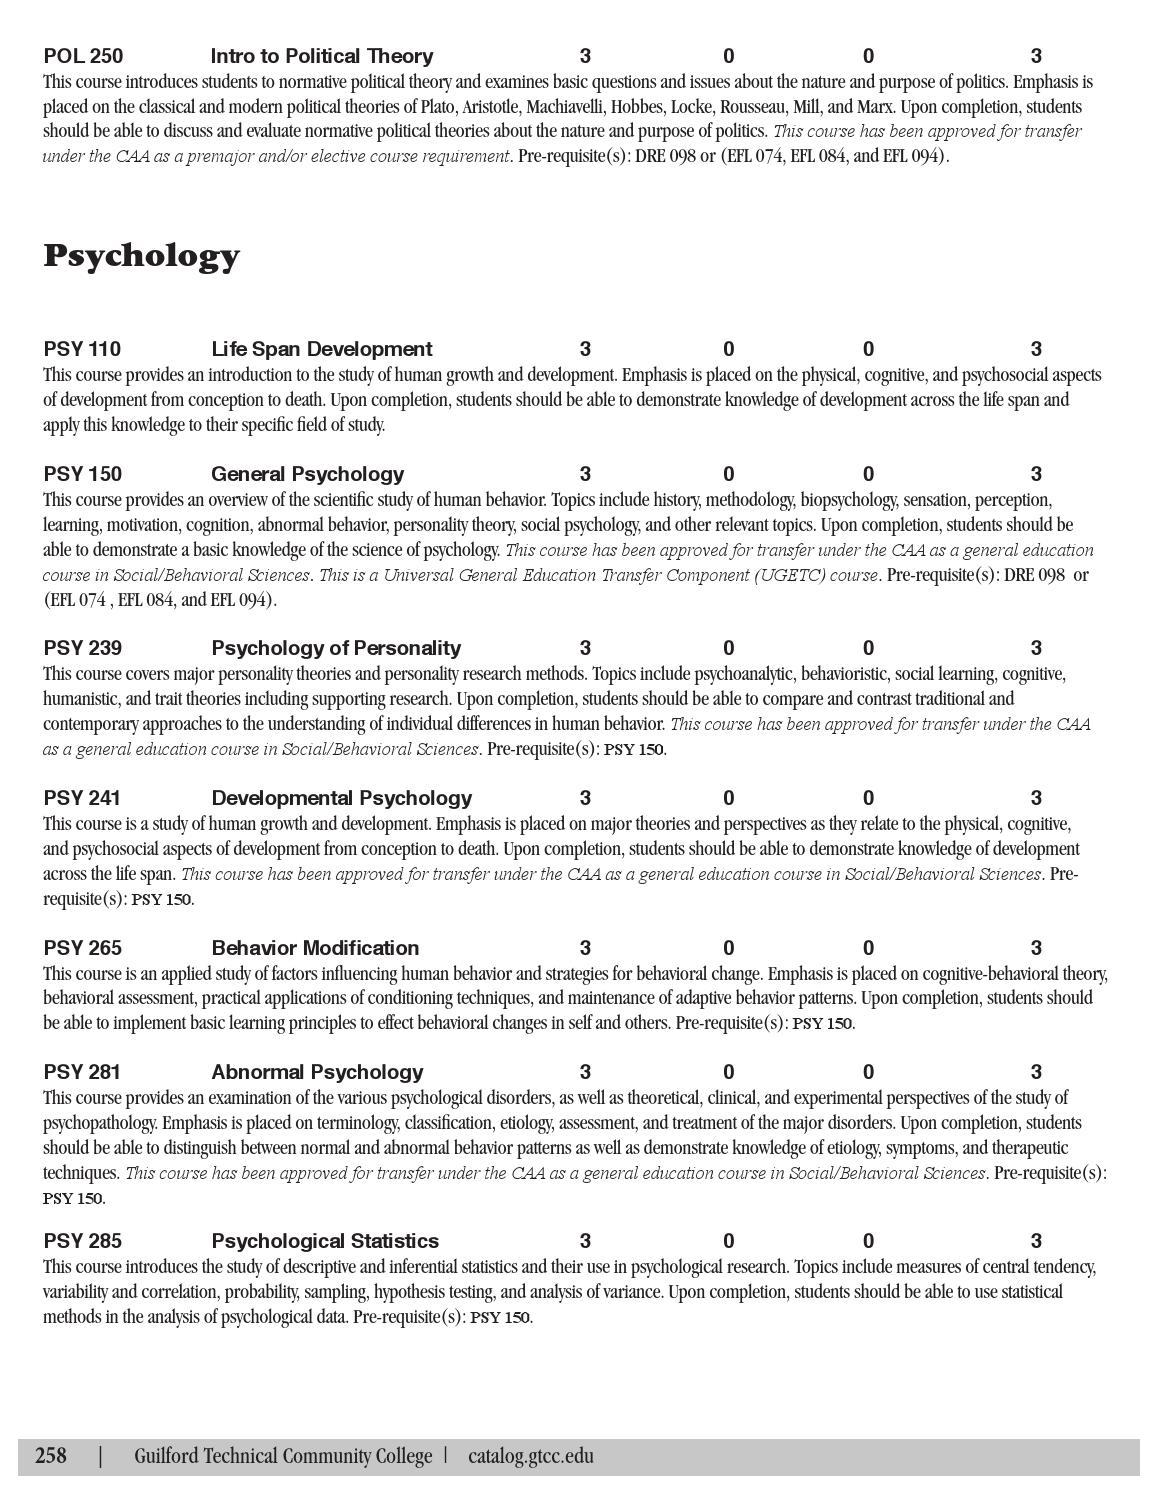 factors influencing human behaviour